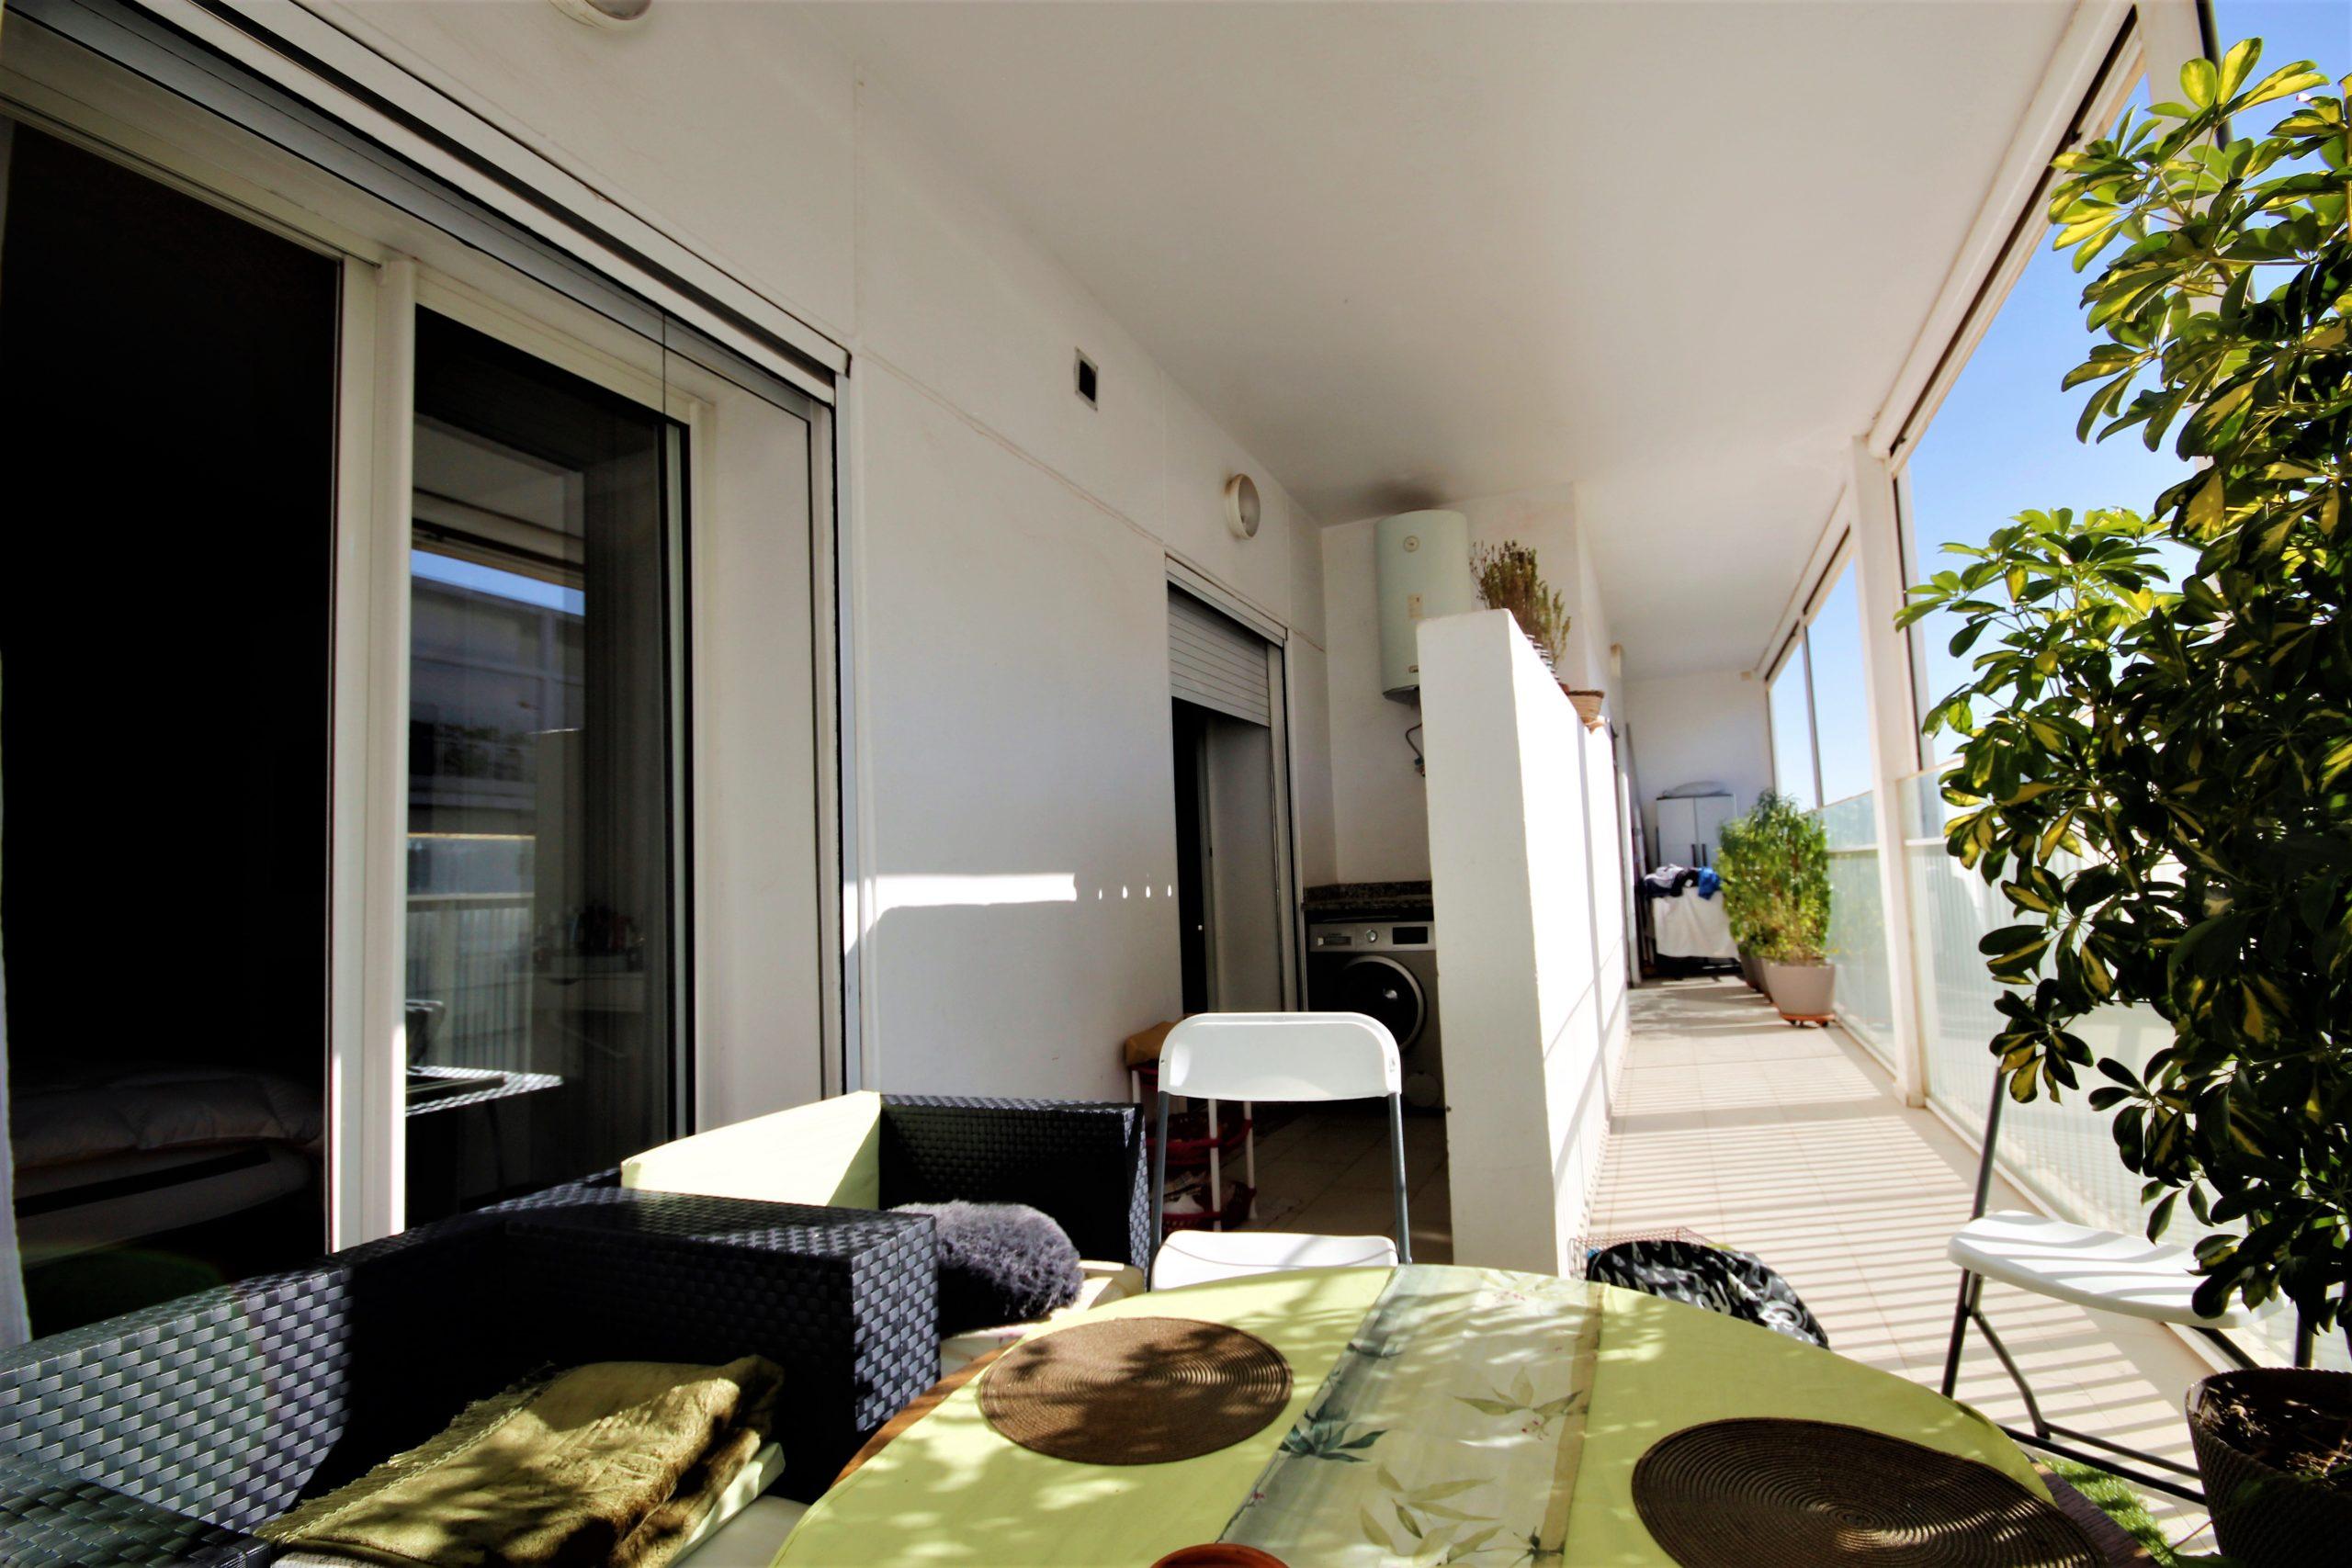 ALMAZ, Casablanca SUD à acheter bel appartement neuf de 177 m² avec terrasse